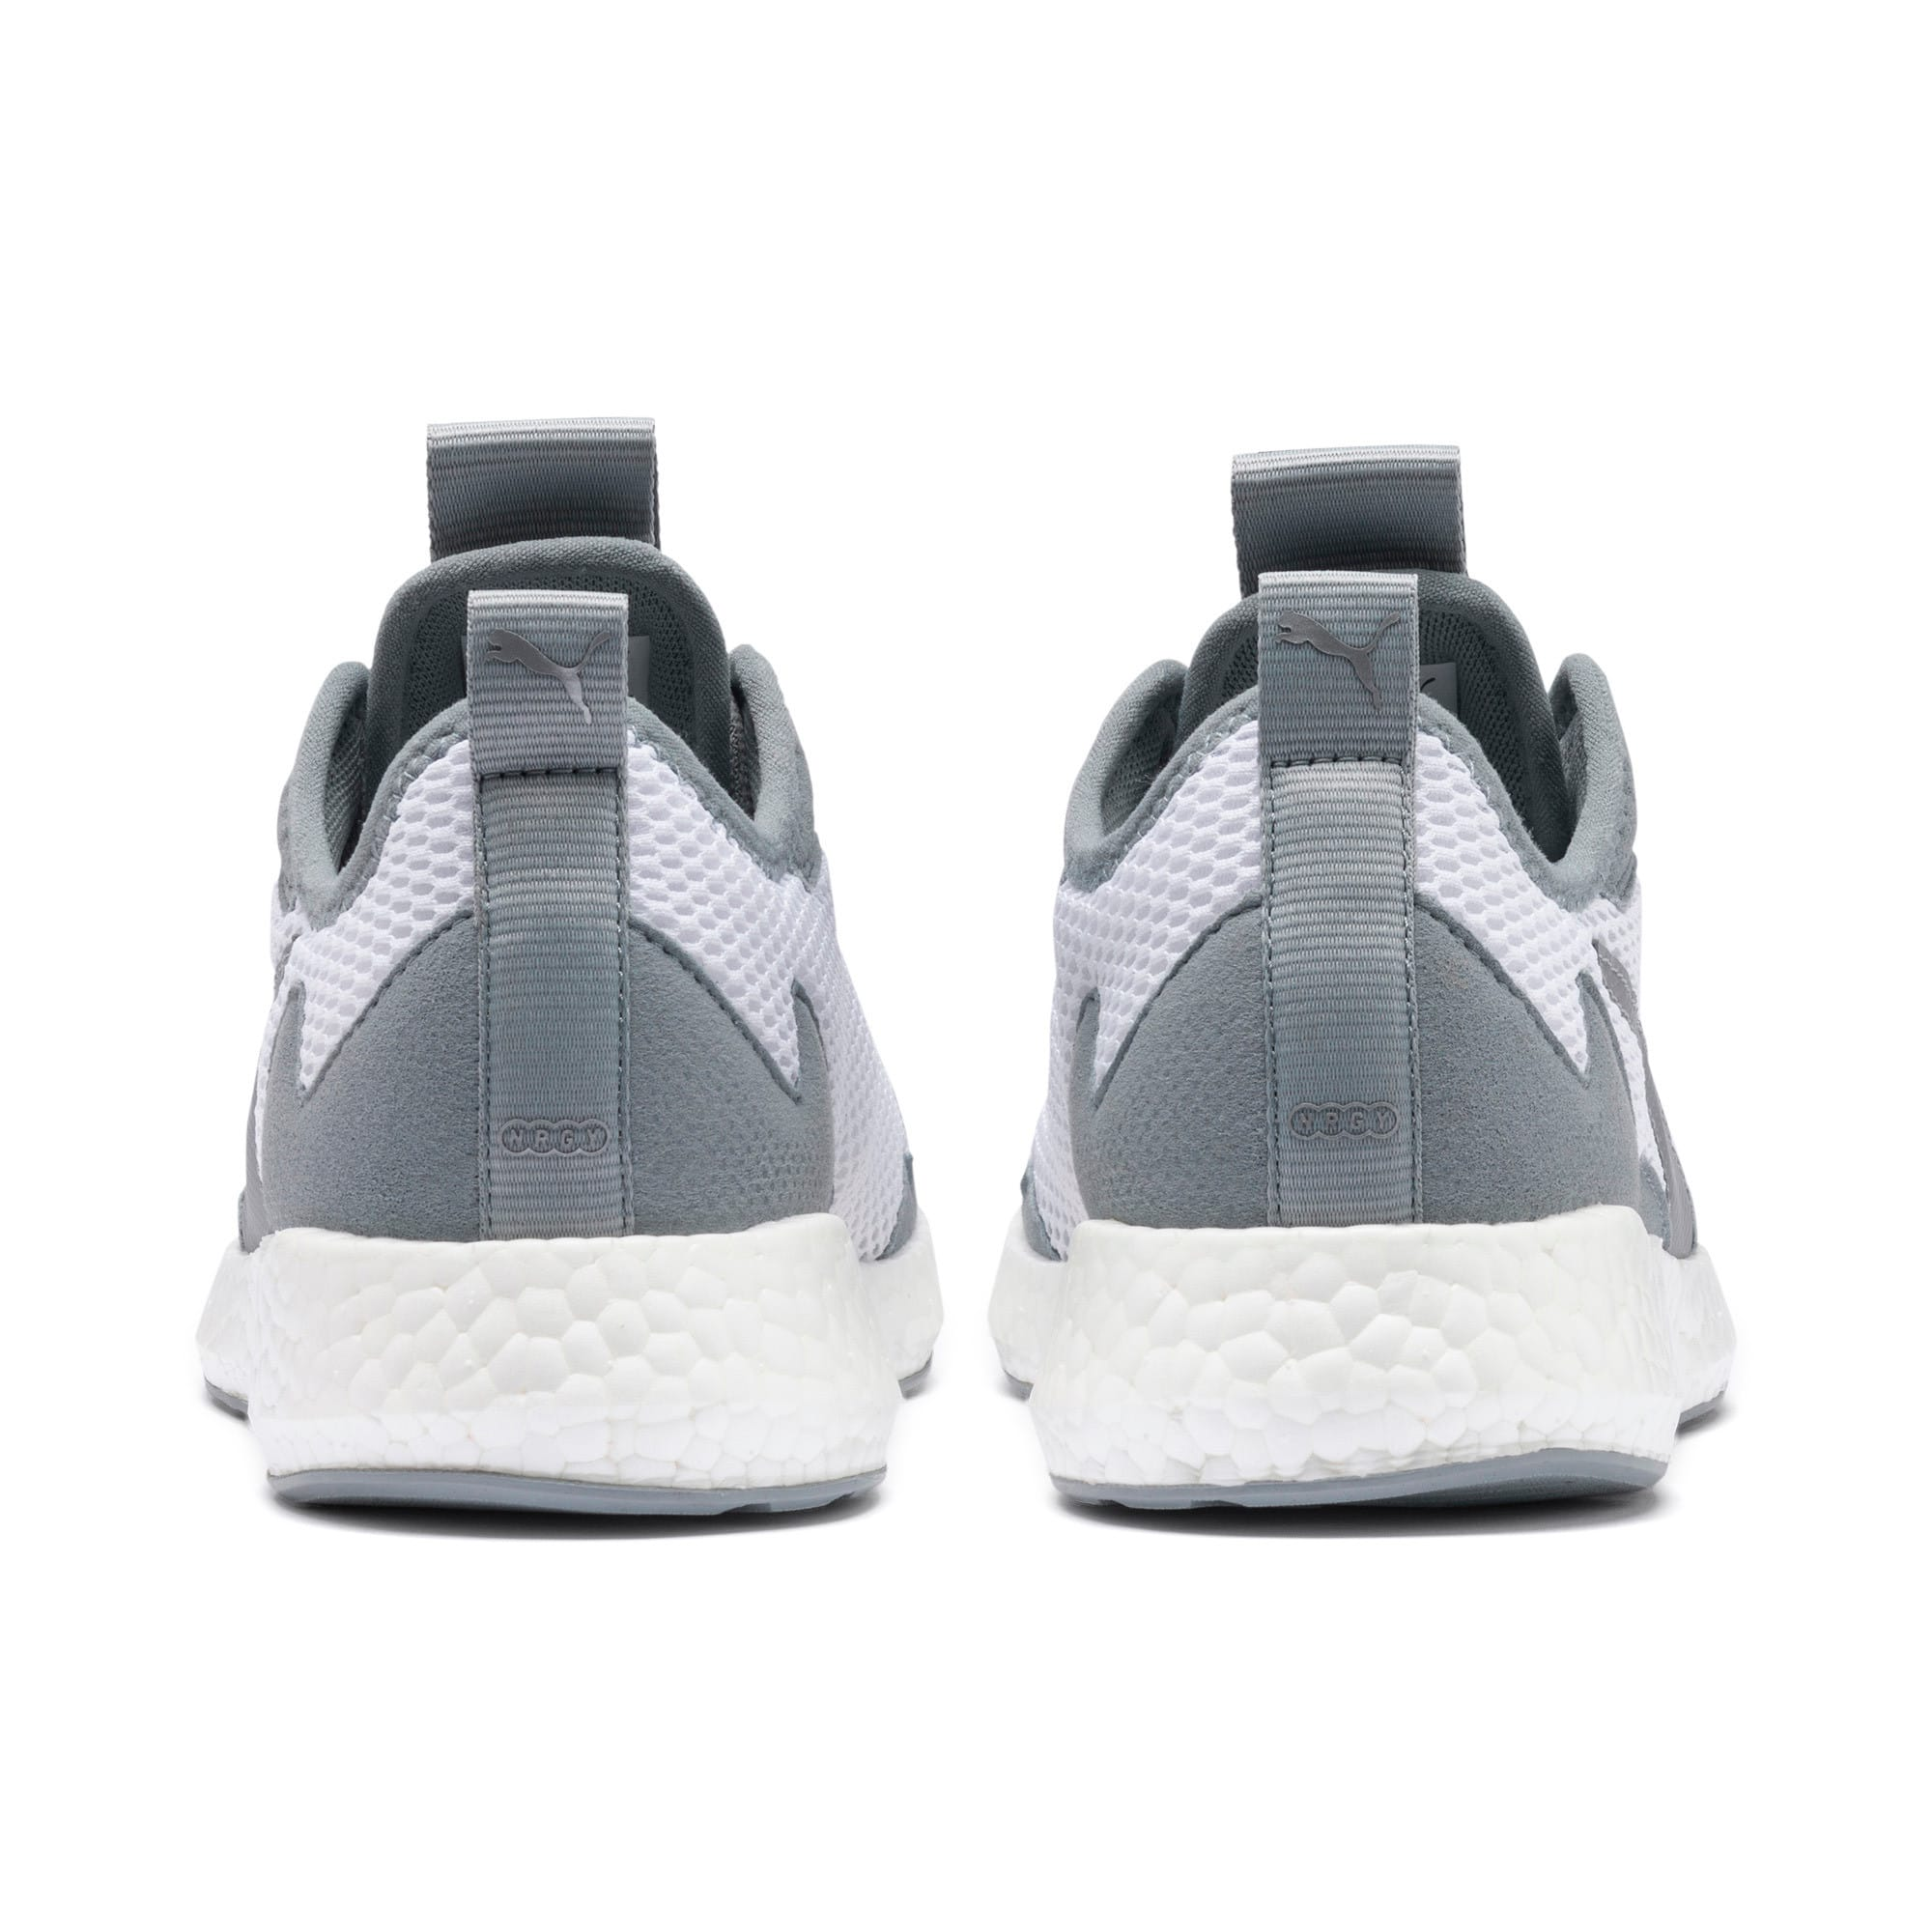 Thumbnail 4 of NRGY Neko Skim Women's Running Shoes, Puma White-Quarry, medium